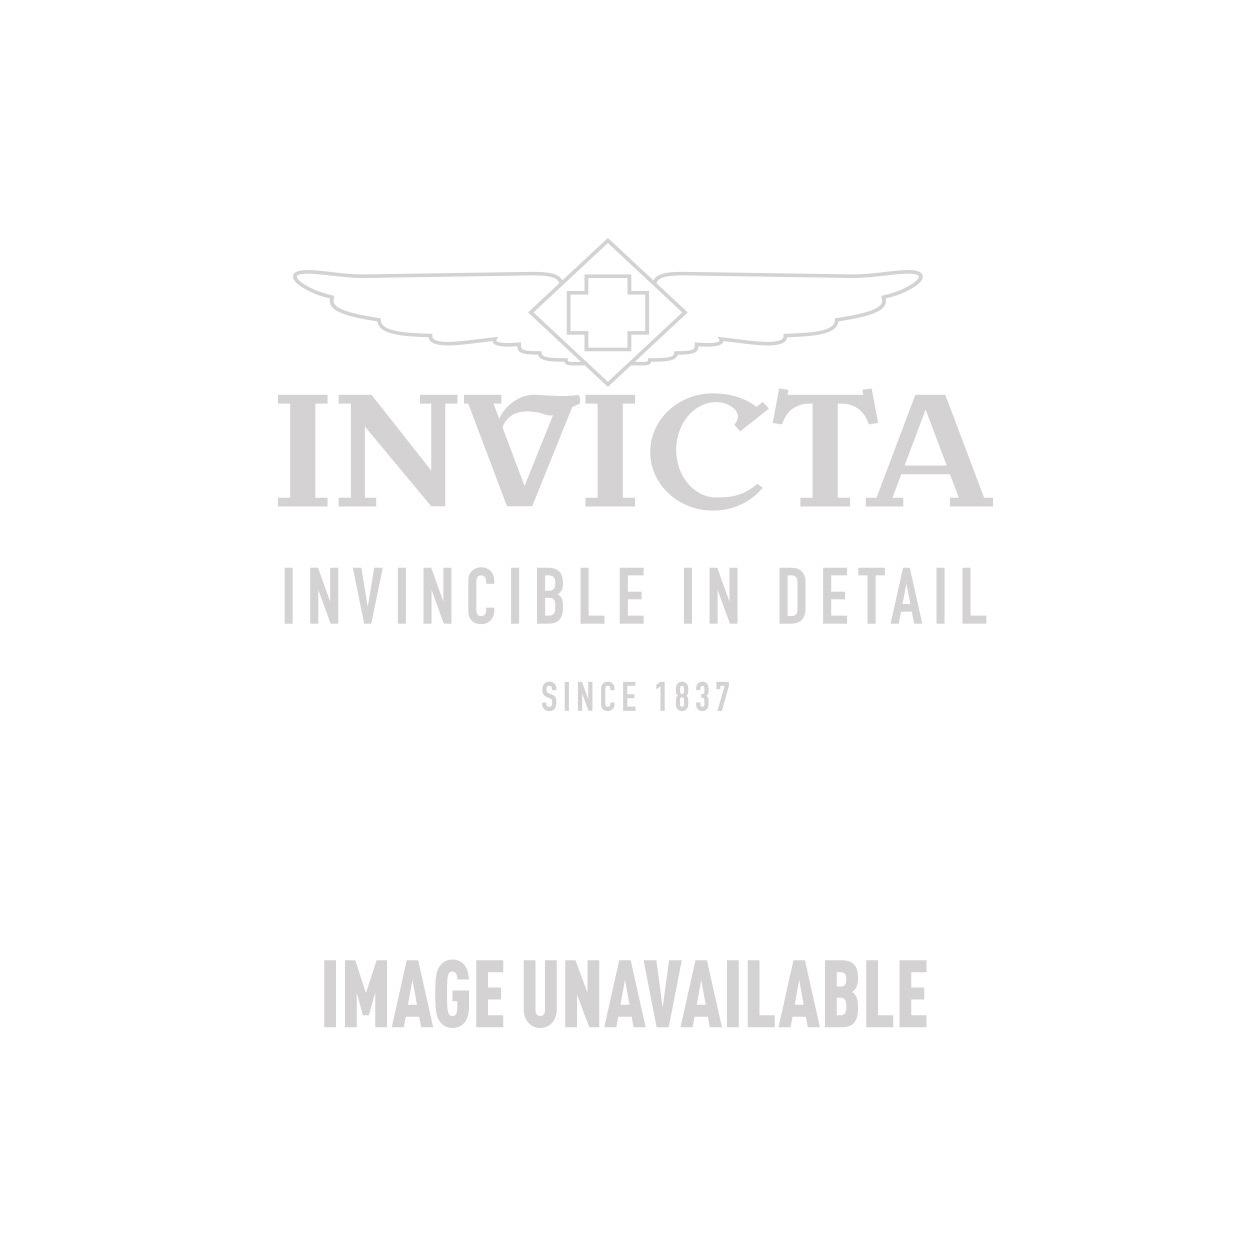 Invicta S1 Rally Swiss Made Quartz Watch - Black, Titanium case with Black tone Silicone band - Model 16812